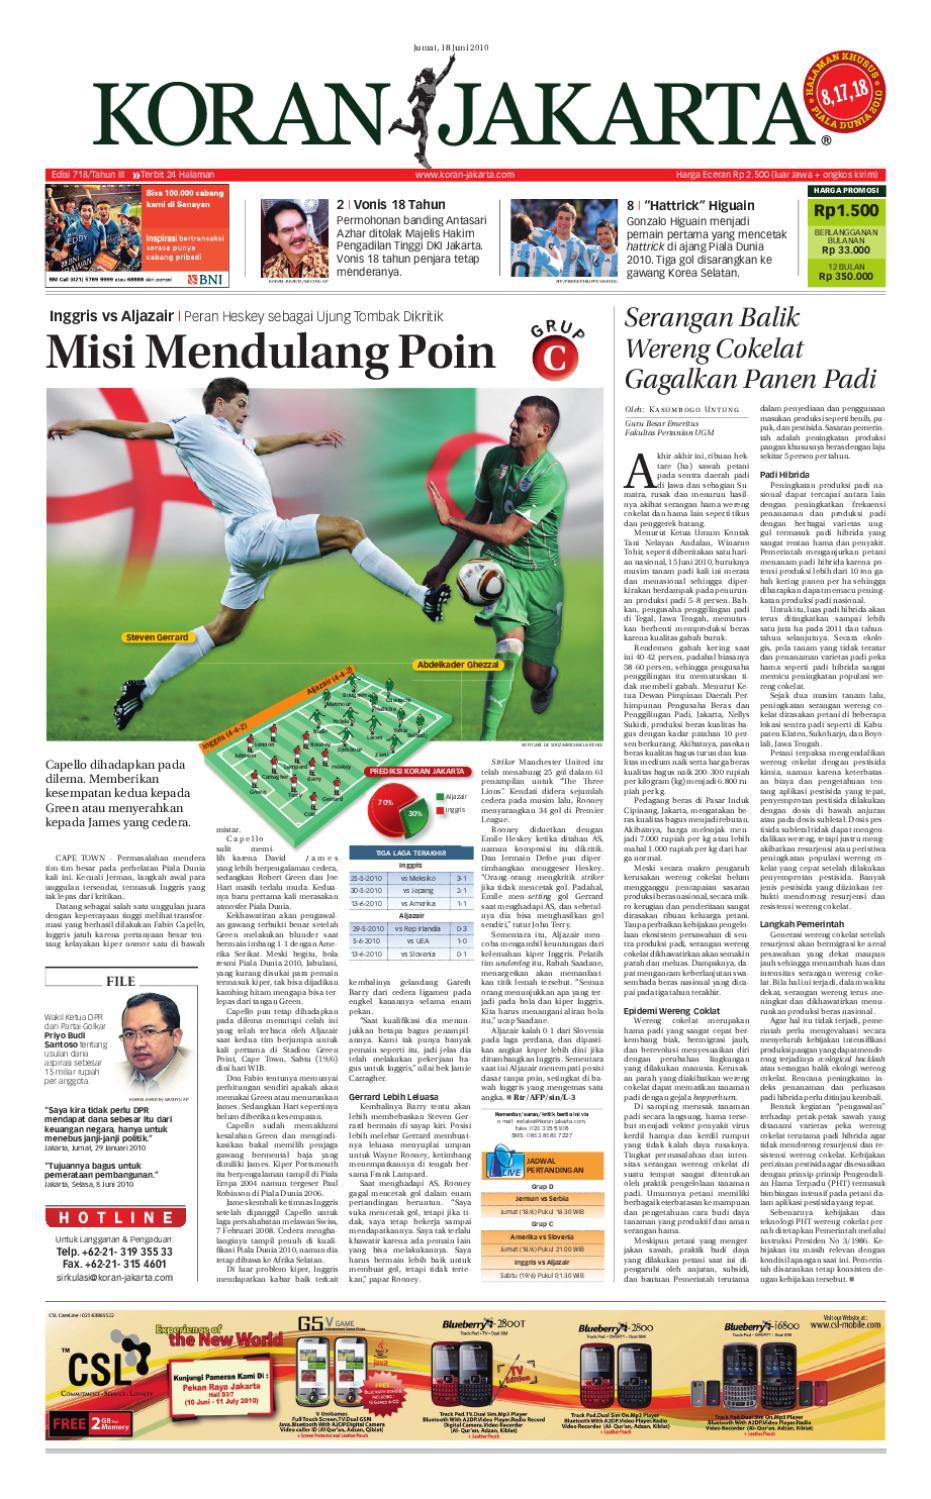 Edisi 718 18 Juni 2010 By Pt Berita Nusantara Issuu Produk Ukm Bumn Jamu Kunyit Asam Seger Waras